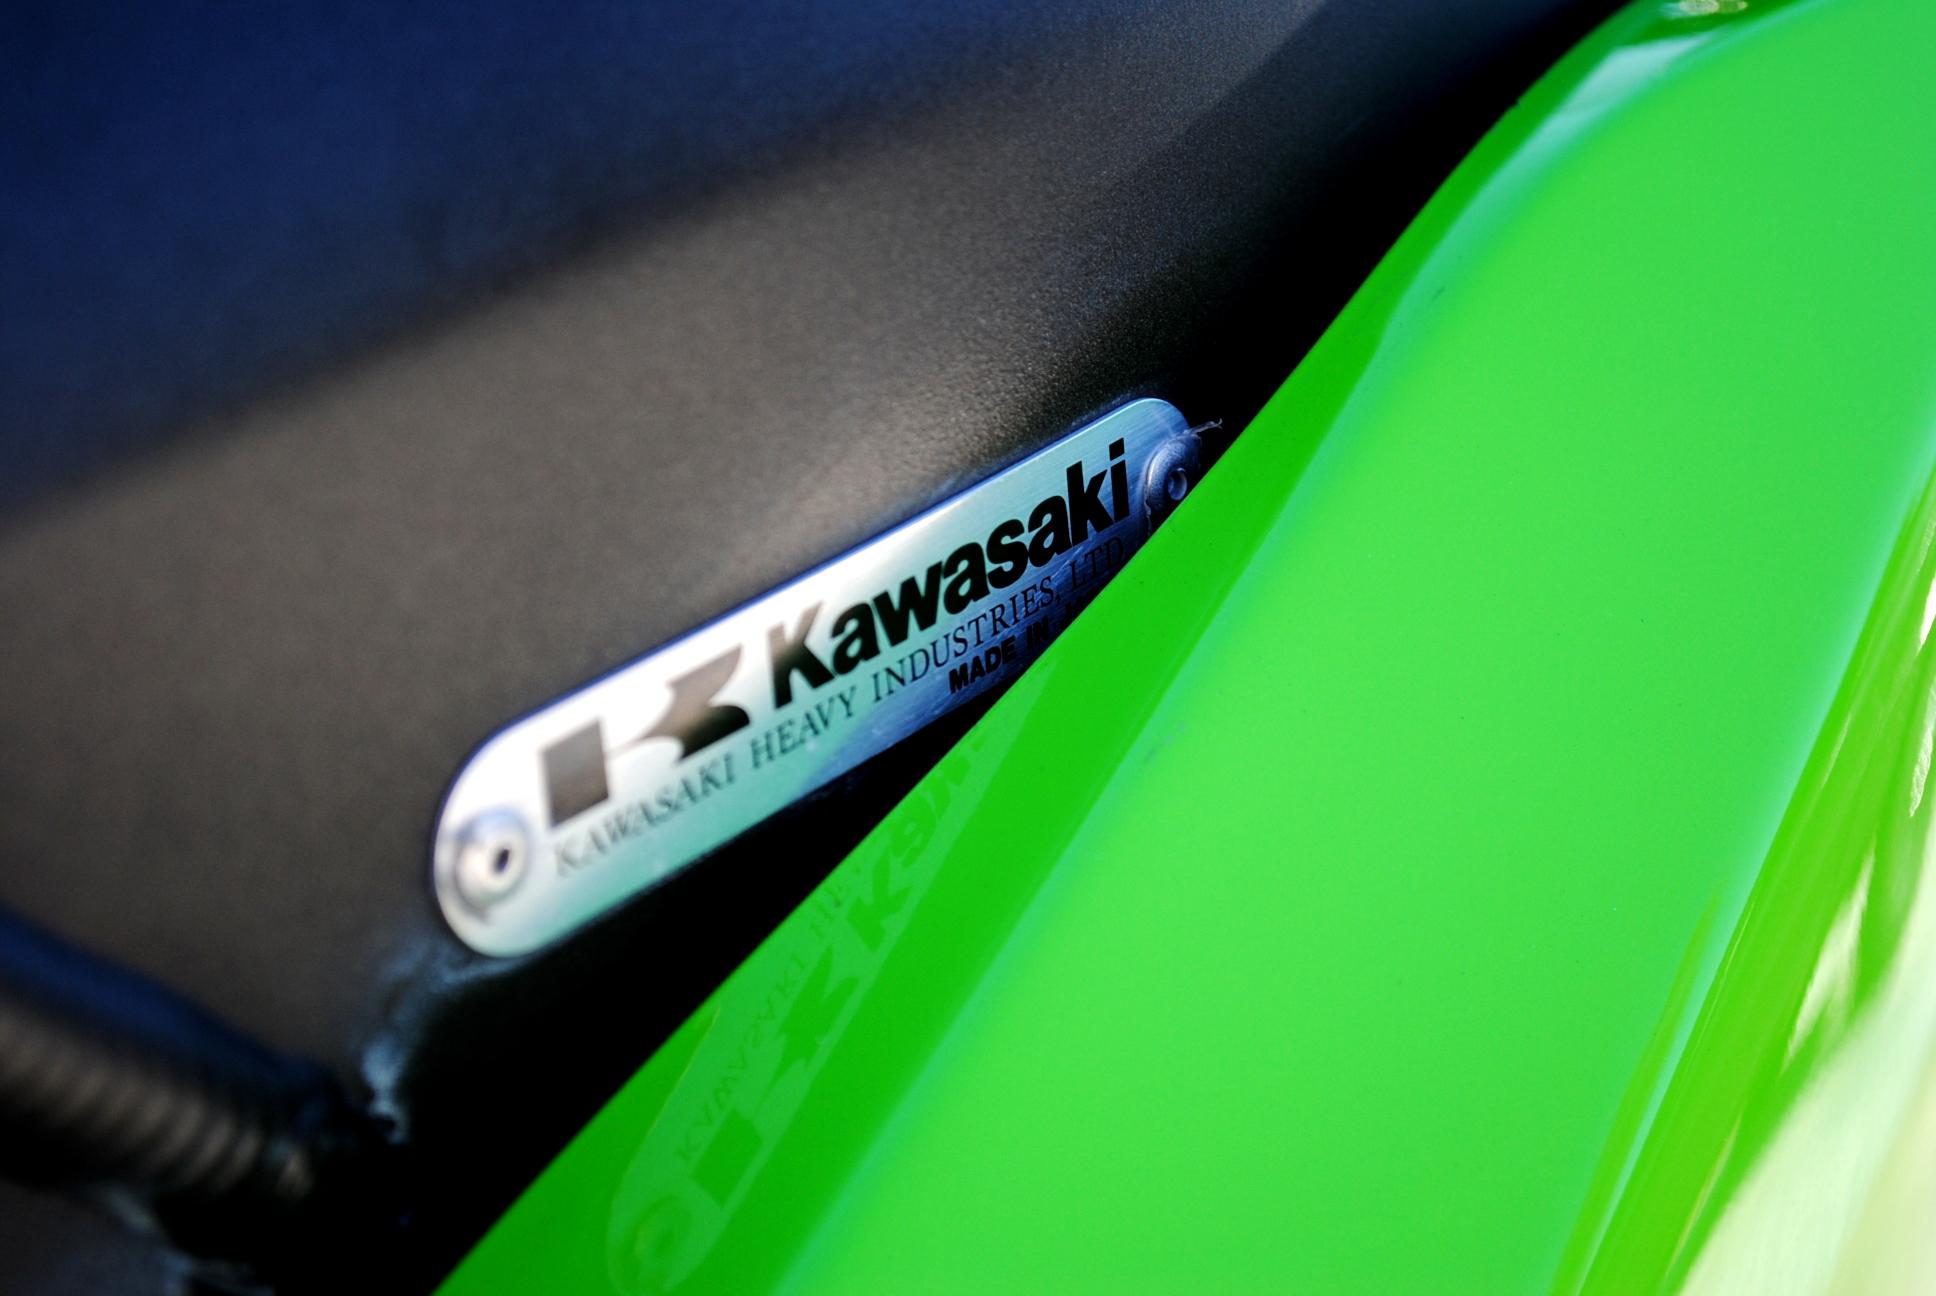 Fahrzeuge - Kawasaki  Hintergrundbild